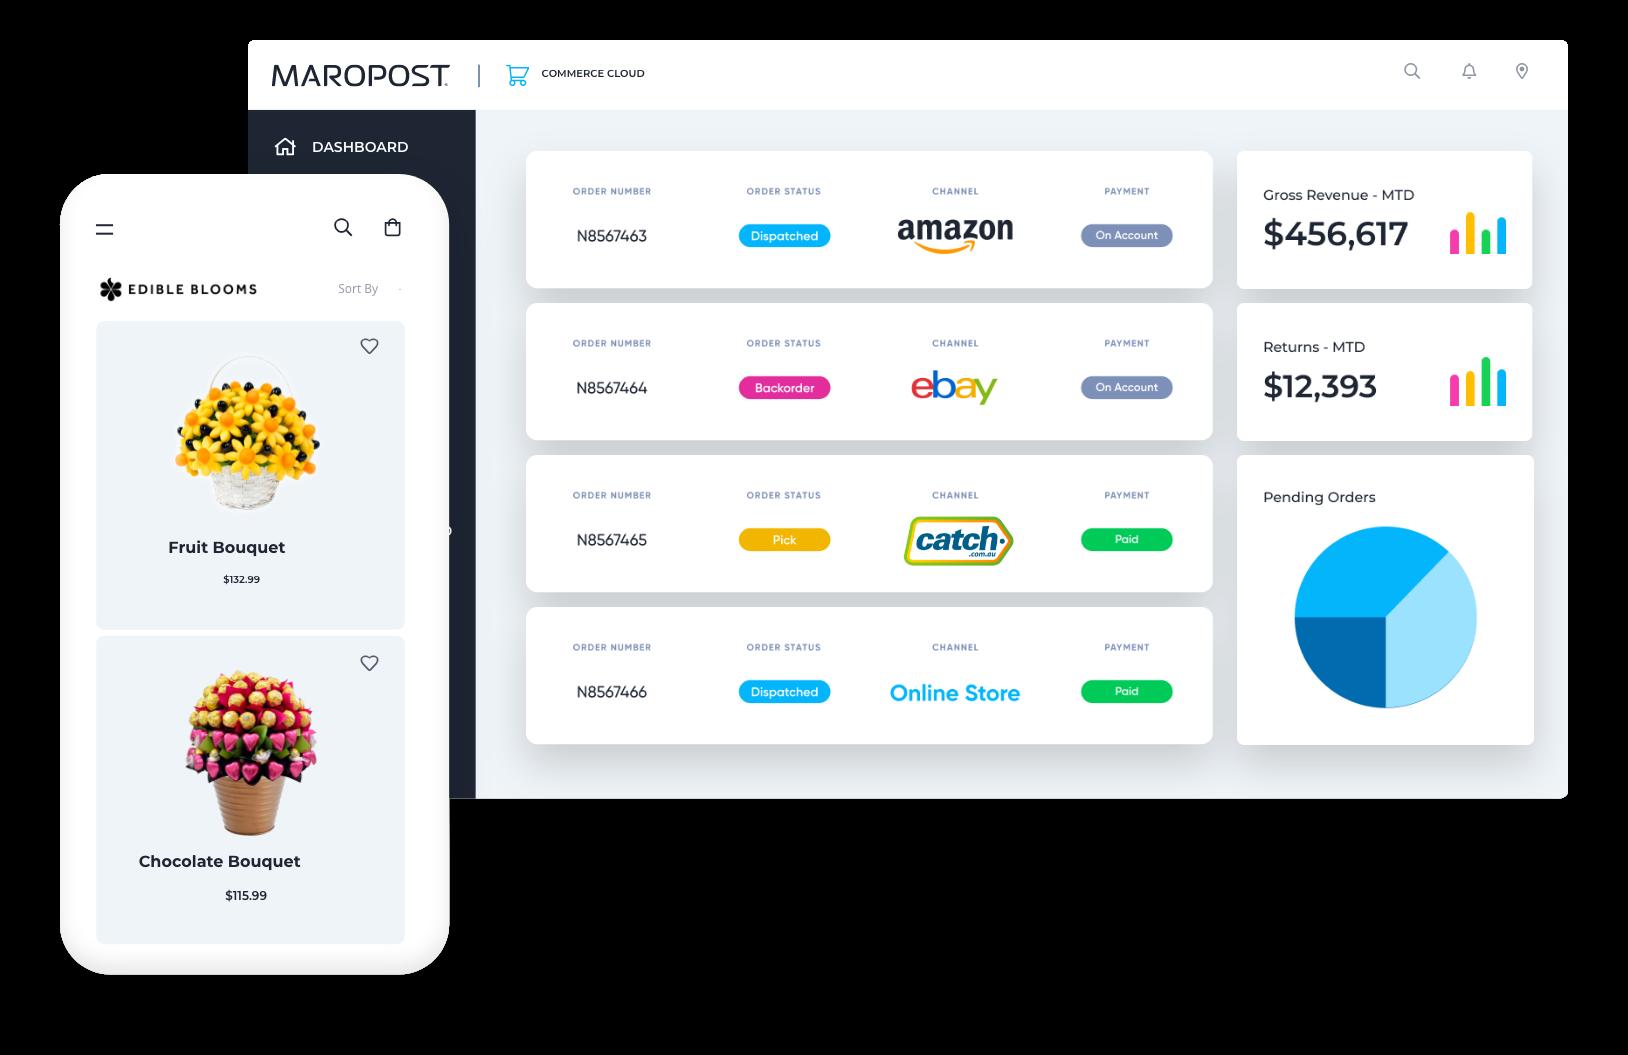 Maropost Commerce Cloud Software - 4